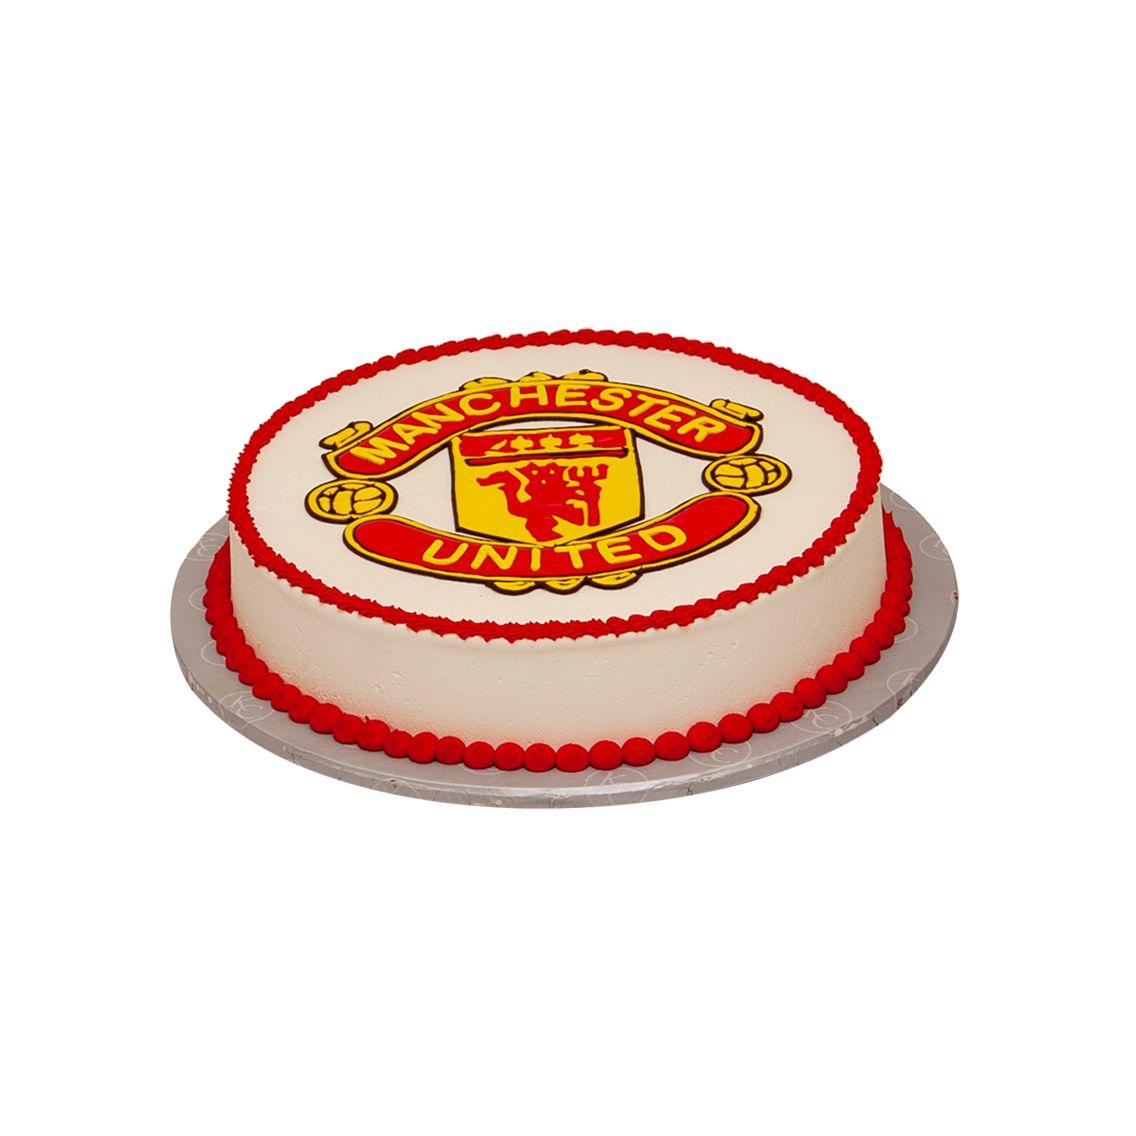 Kitchen Cuisine Default Category Manchester United Cake